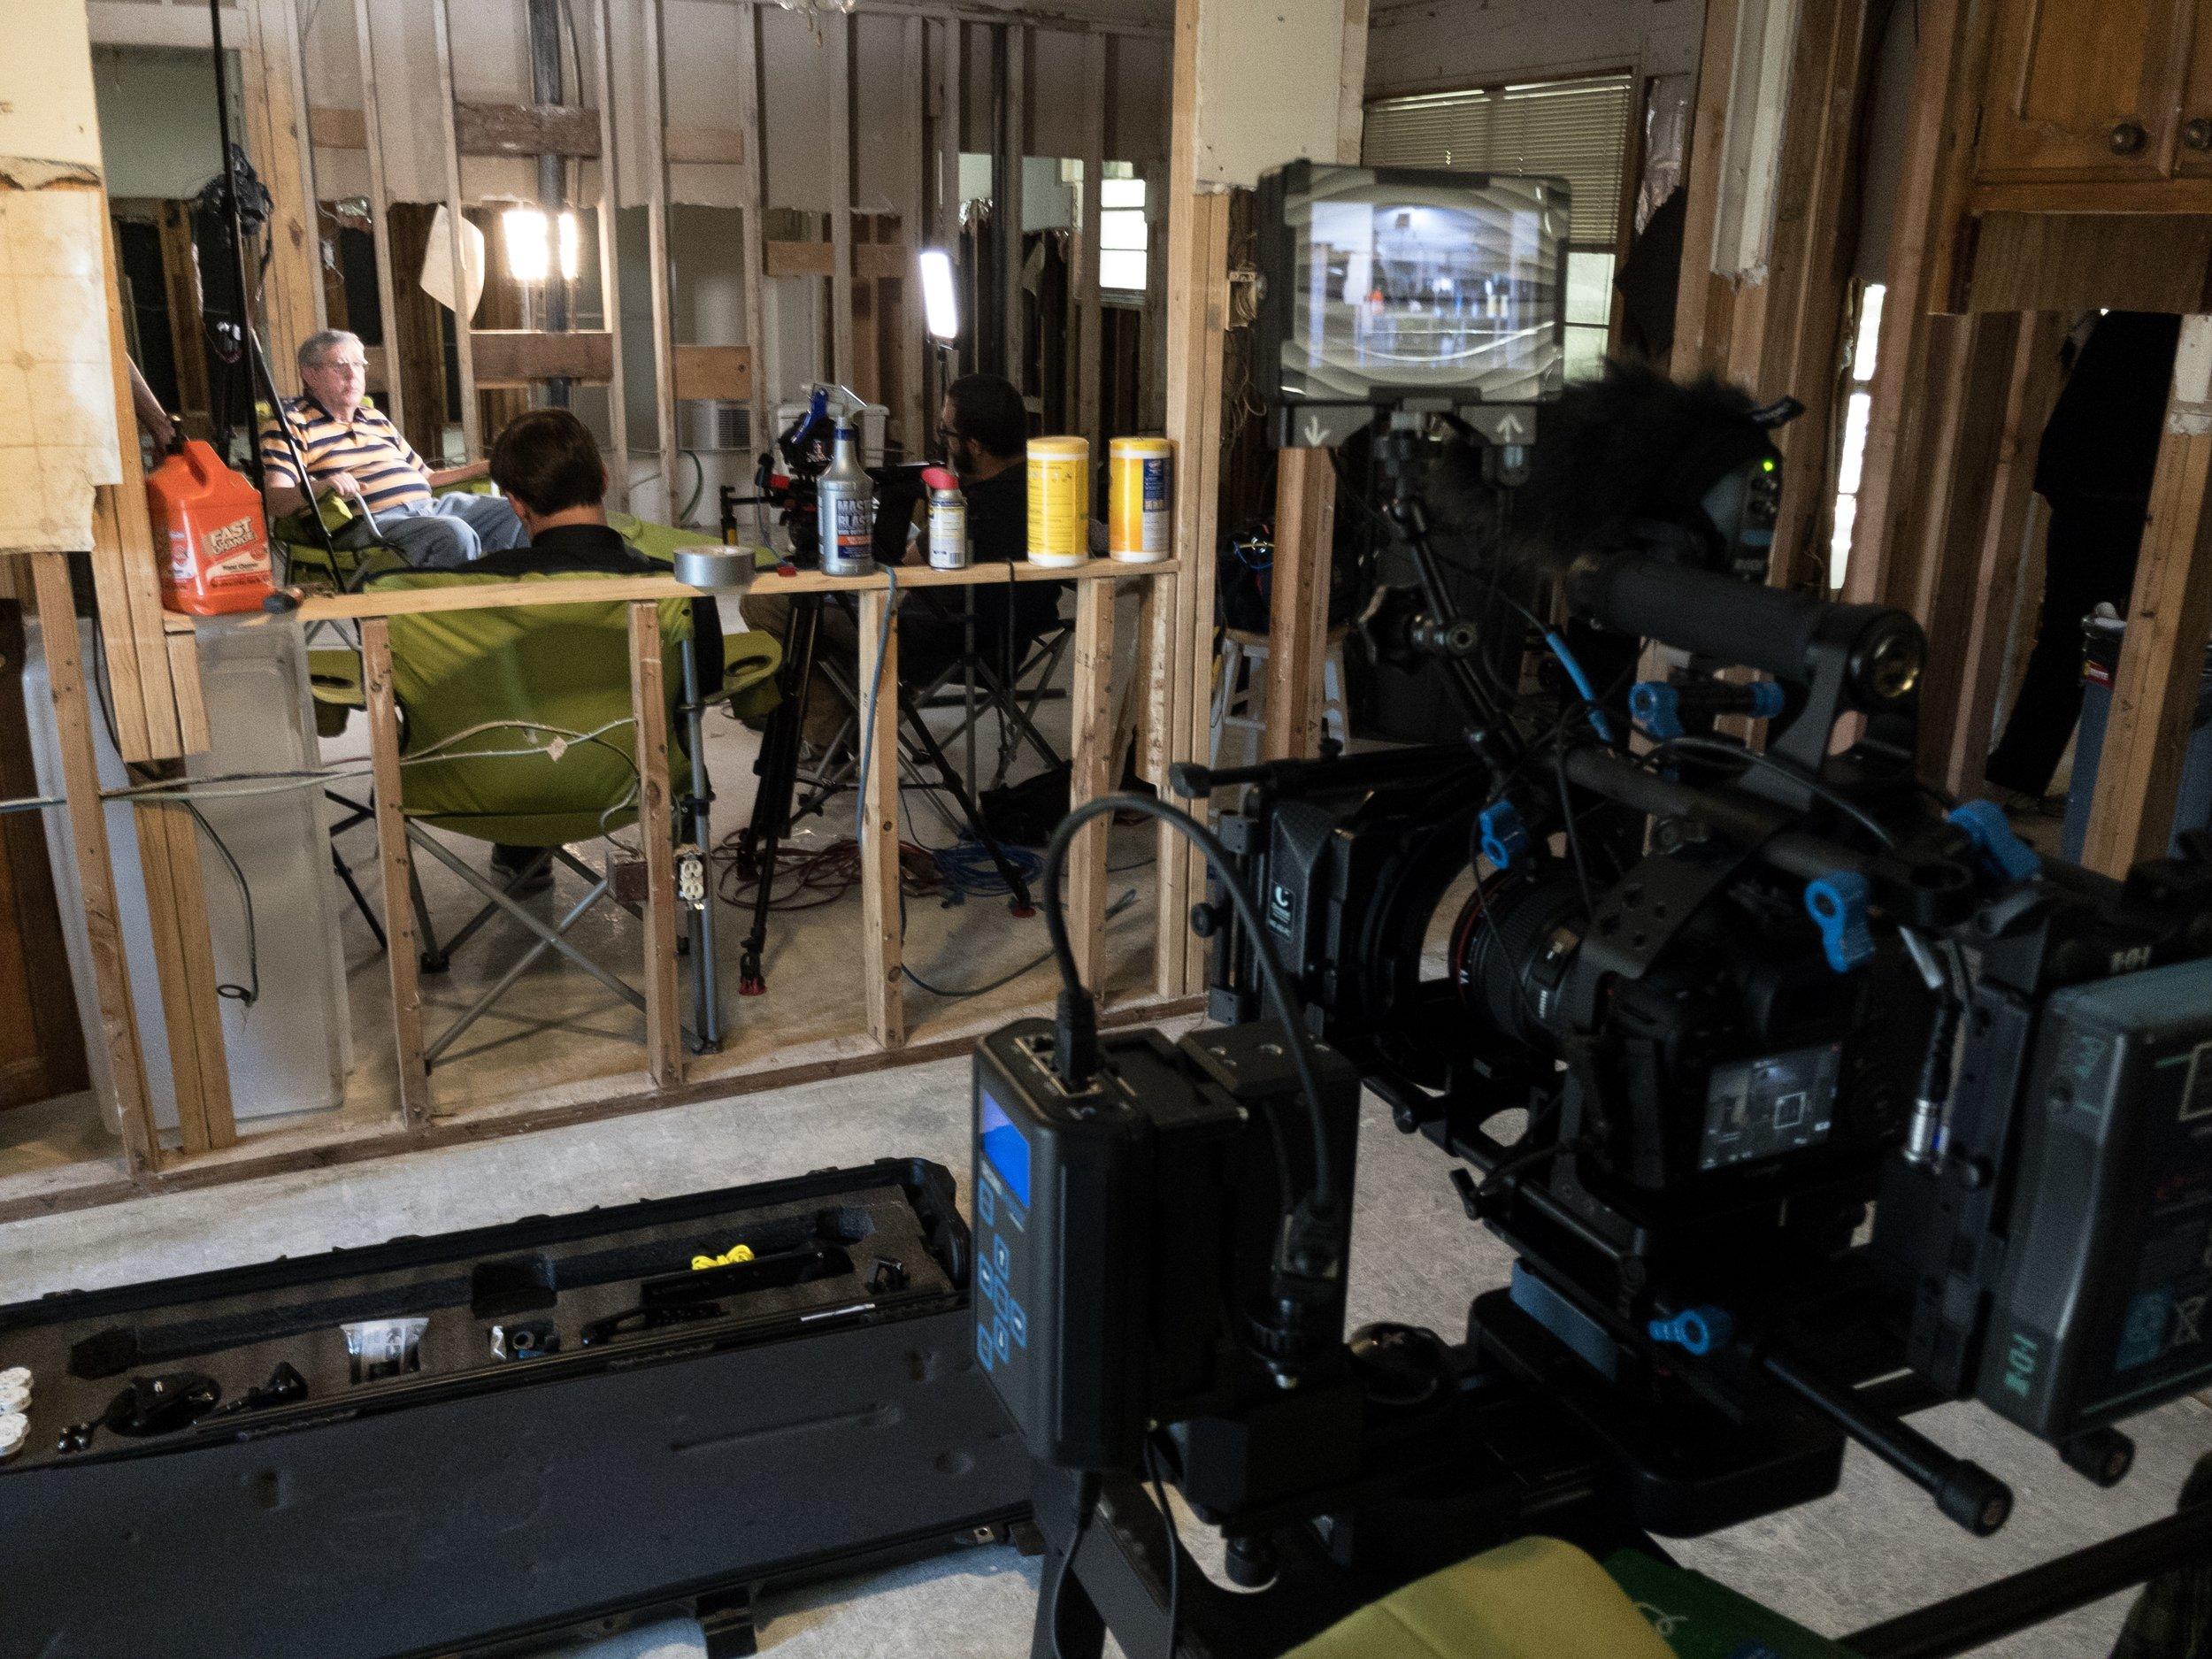 Filming Bill's interview